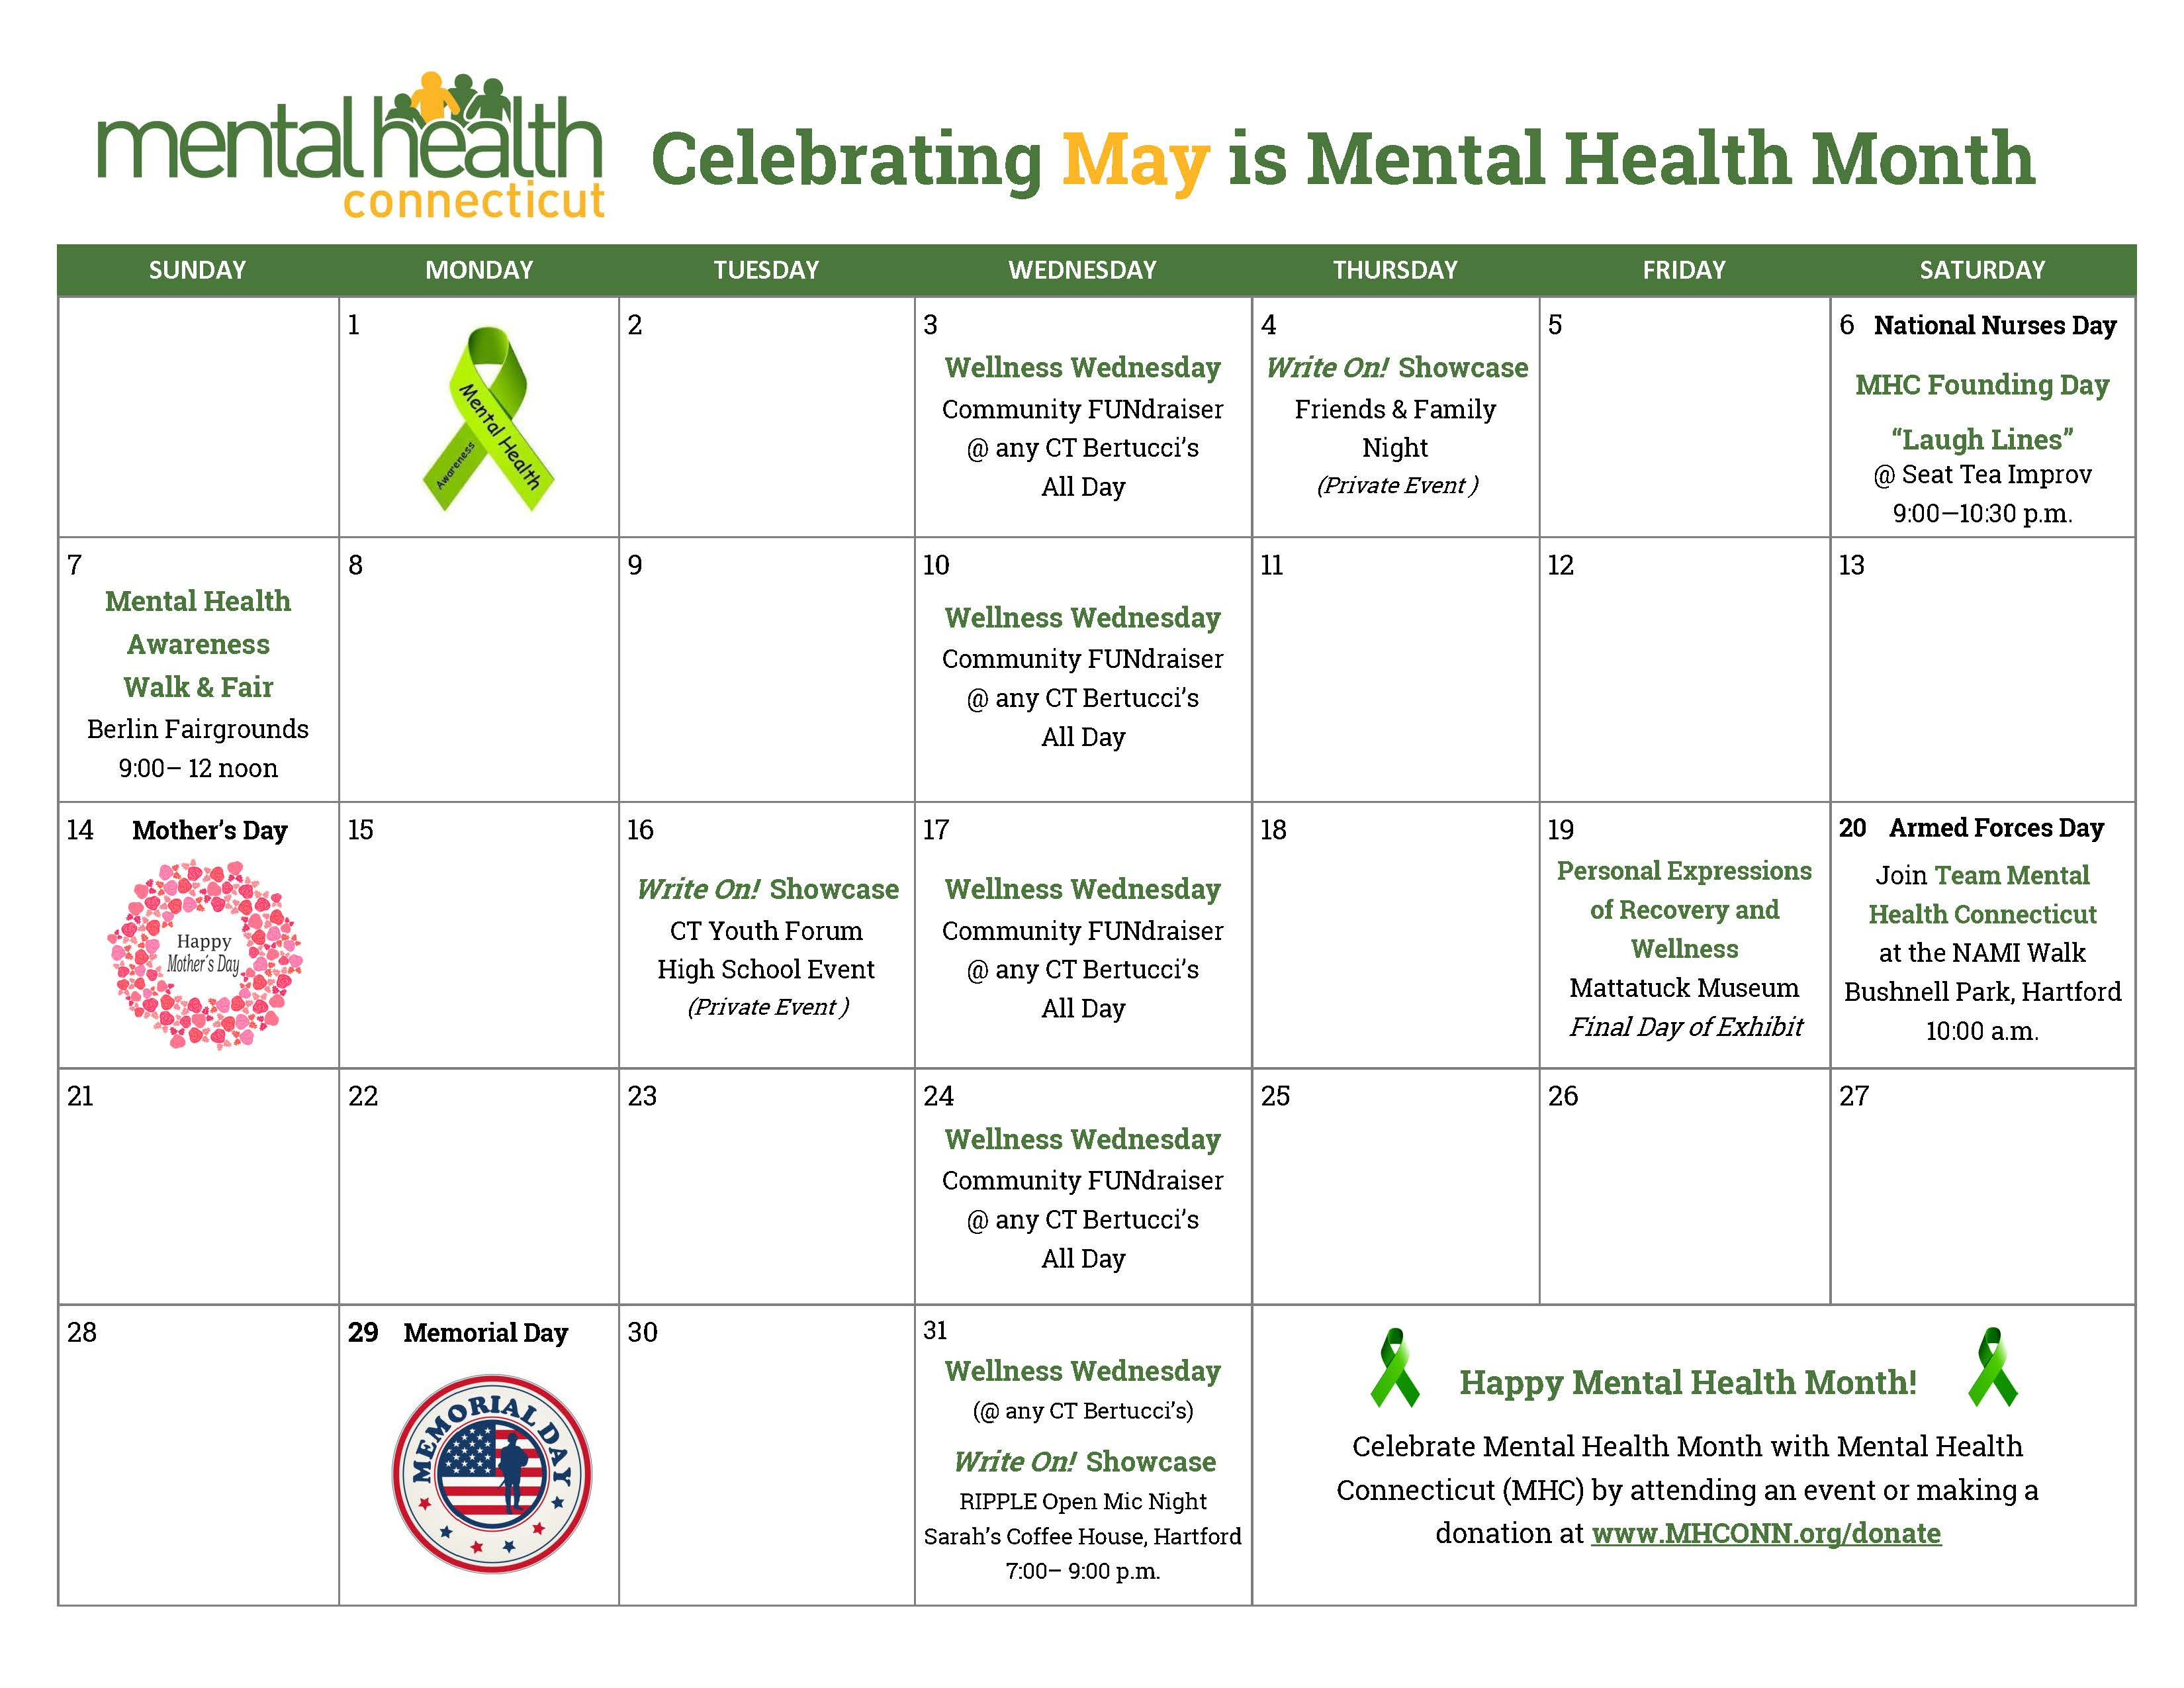 Mental Health Month - Mental Health Connecticut